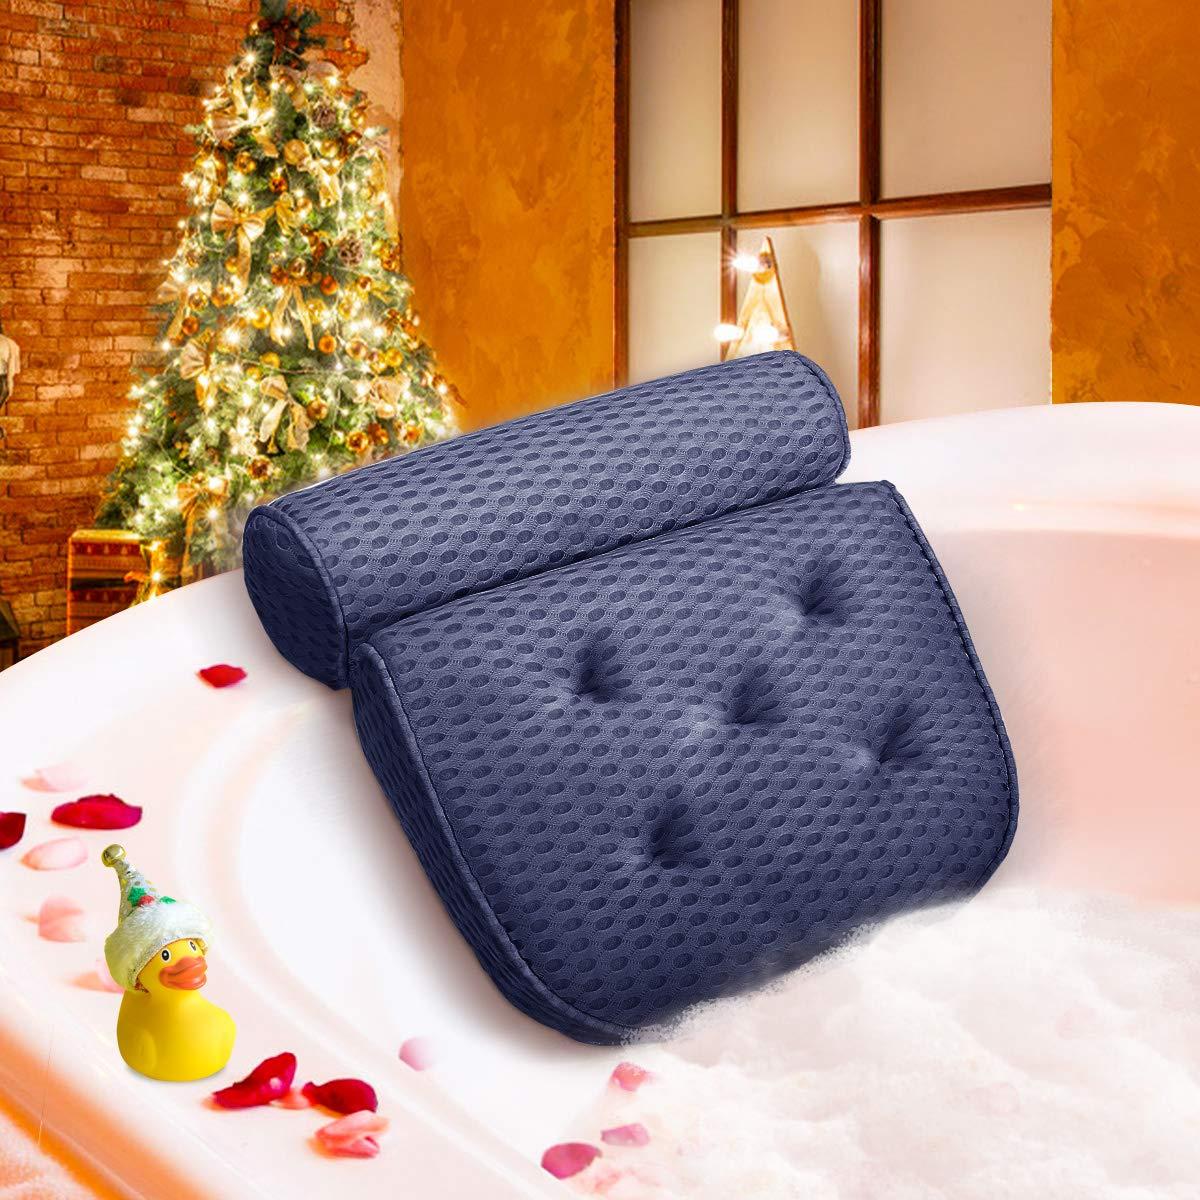 ESSORT Bath Tub Special price Pillow Comfort Pad Bathtub with Classic Luxury Cushion